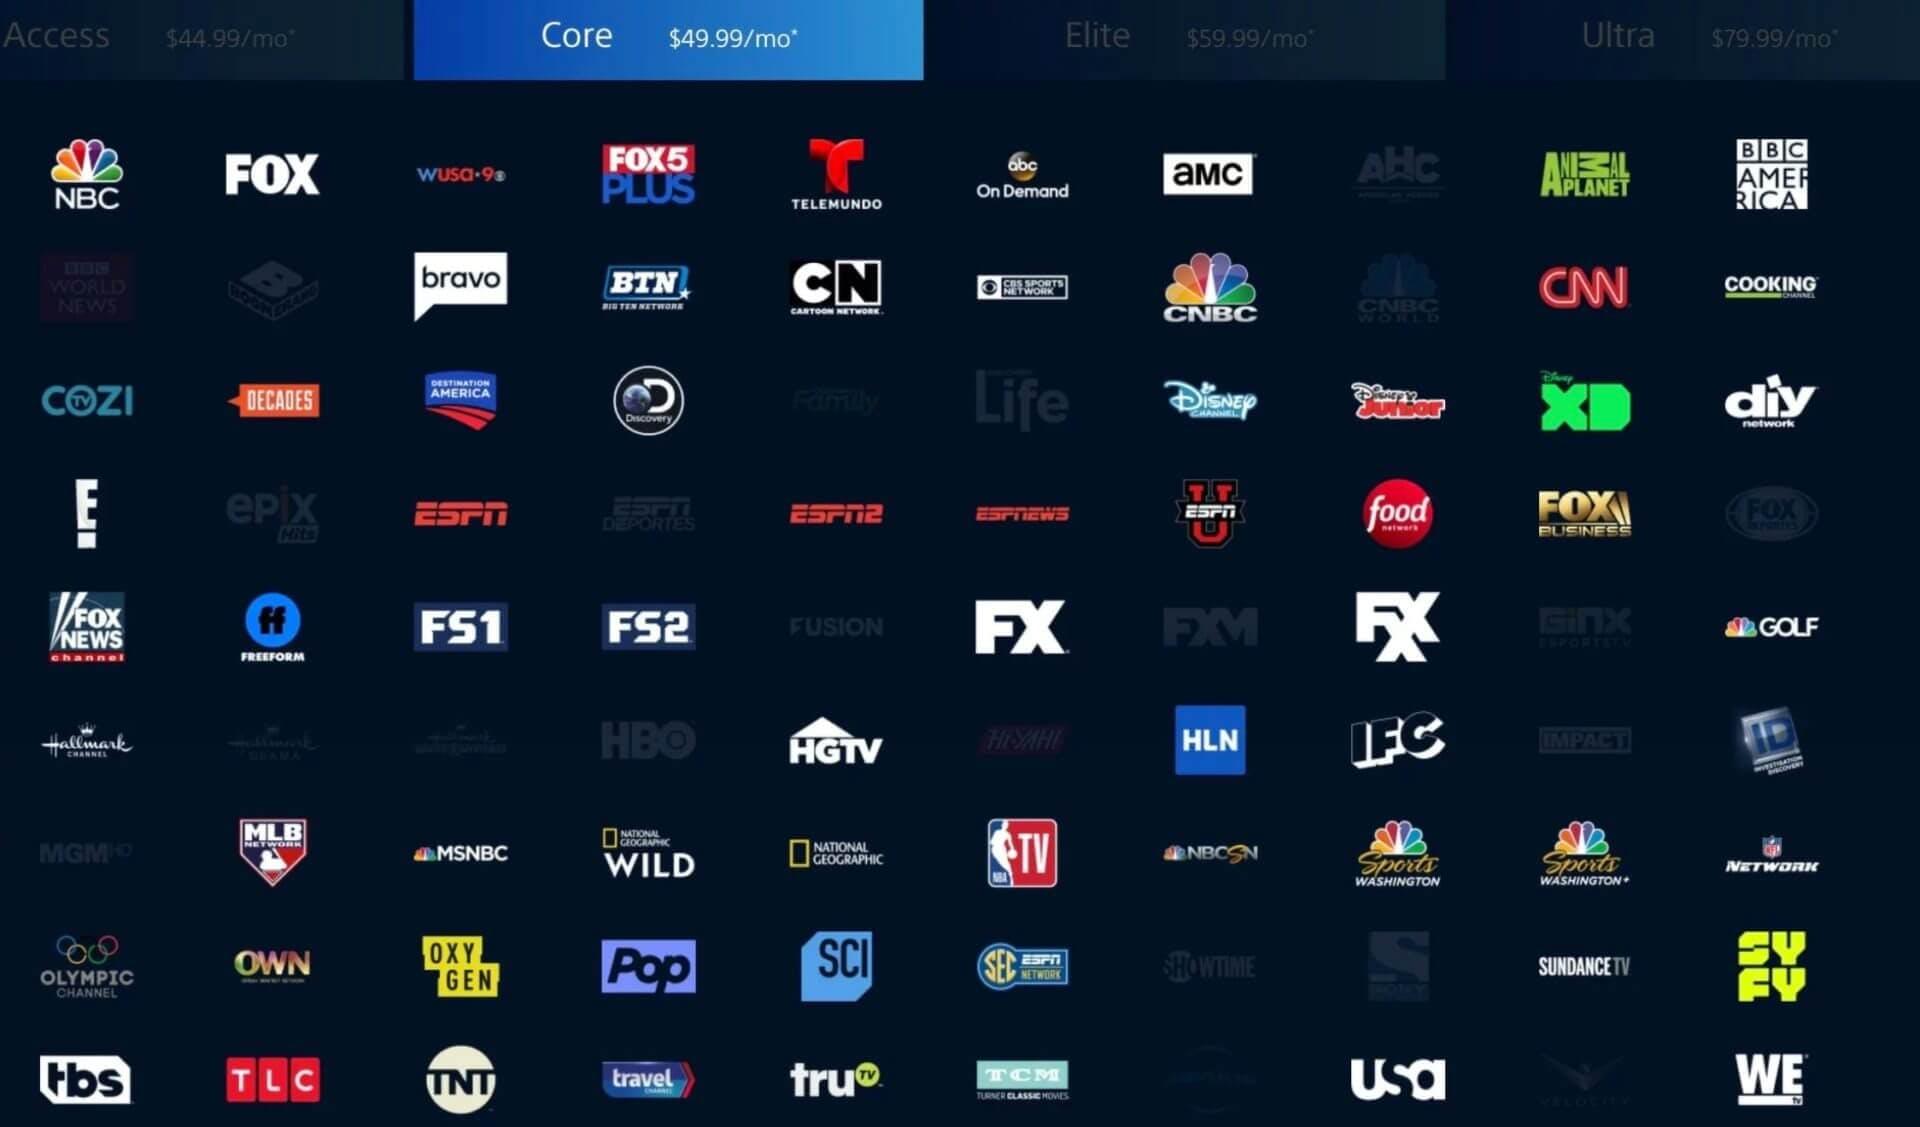 2019-20 premier league manchester united vs arsenal soccer live stream free playstation vue